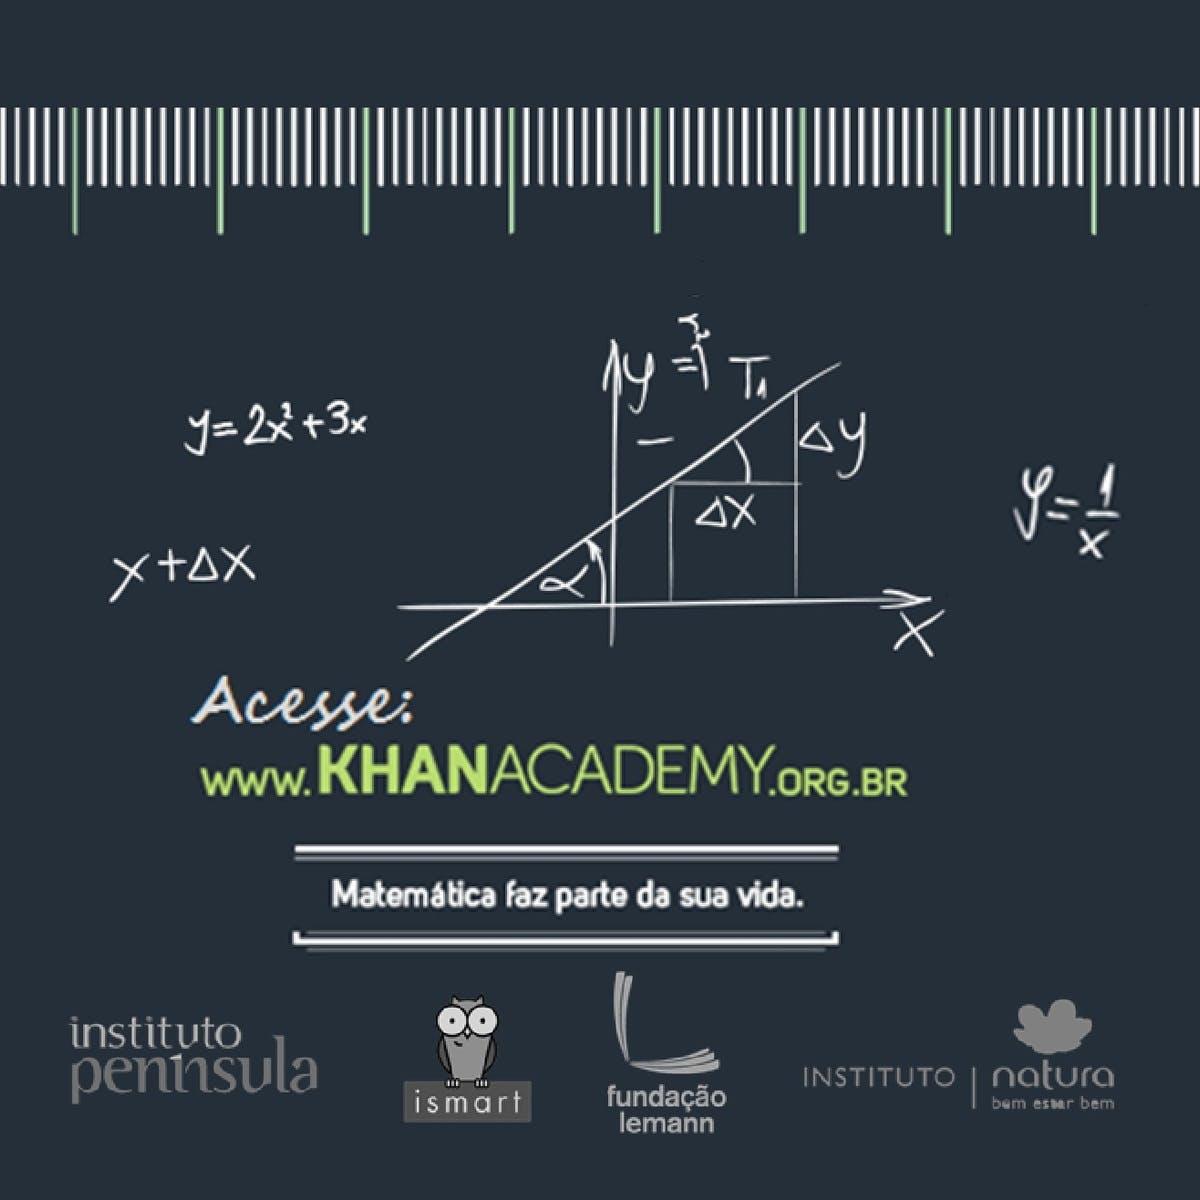 Explorando os recursos educacionais da Khan Academy